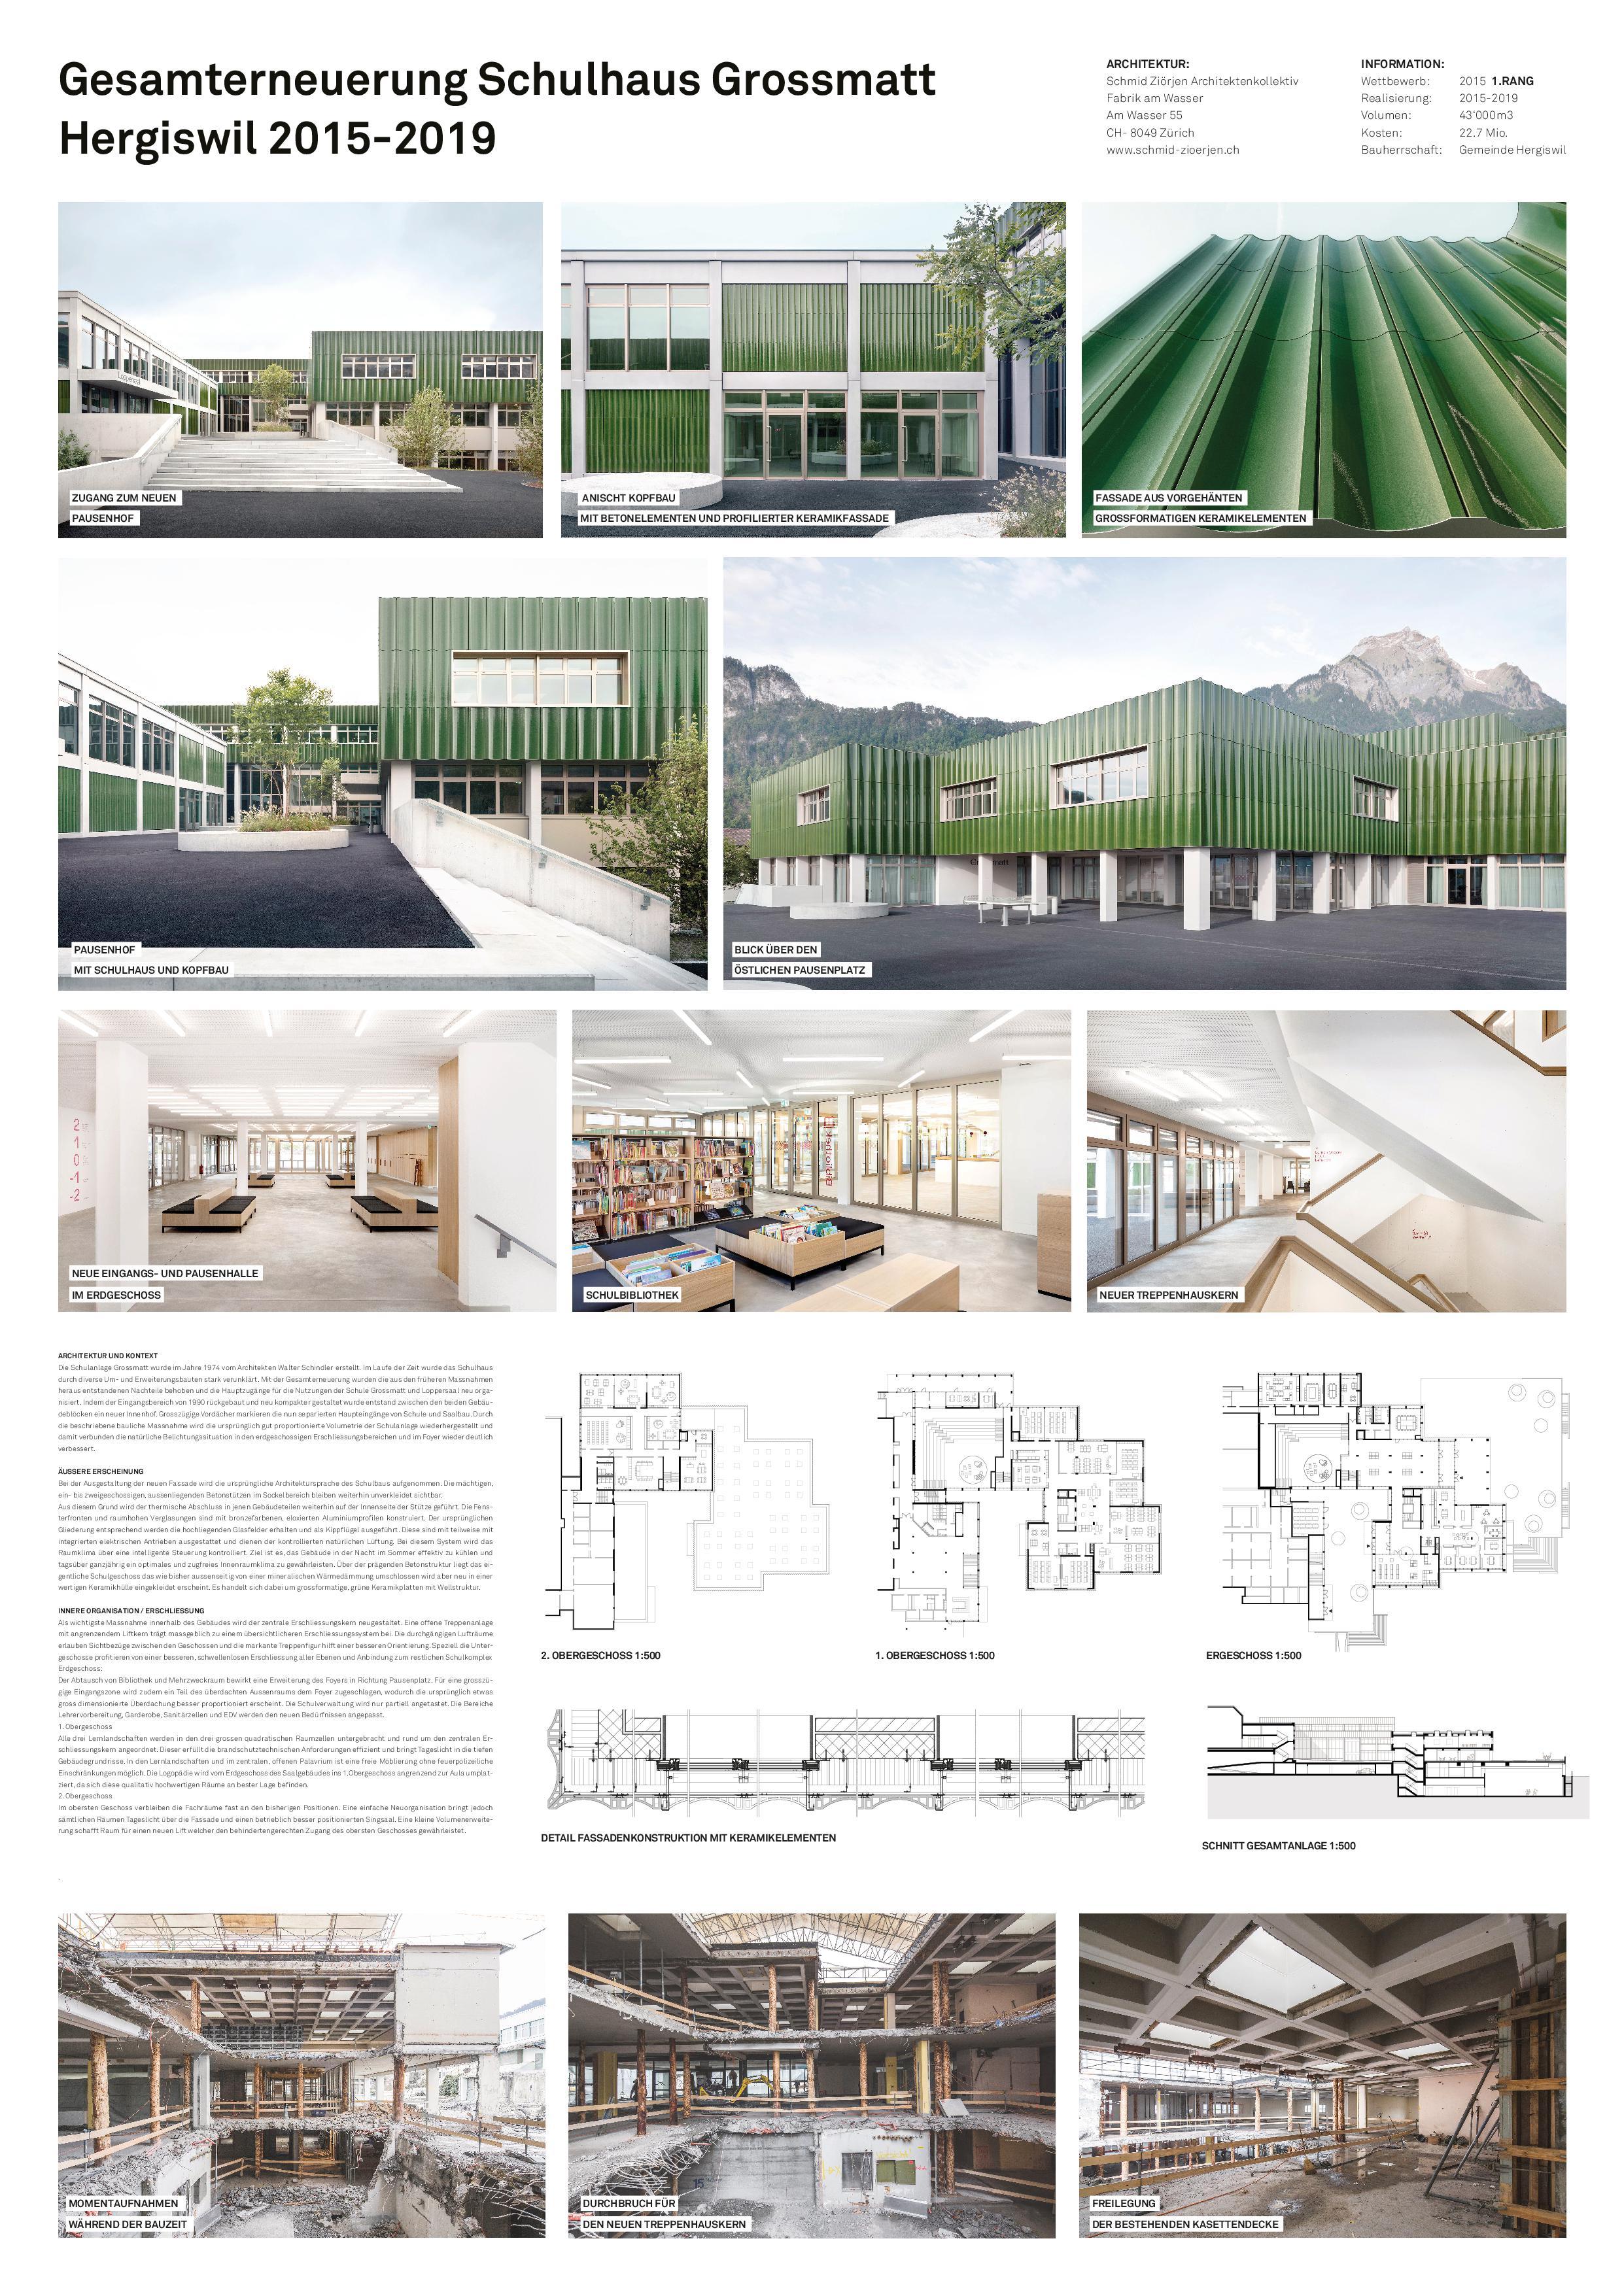 A0_Plakat Gesamterneuerung Schulhaus Grossmatt Hergiswil  von Schmid Ziörjen Architektenkollektiv